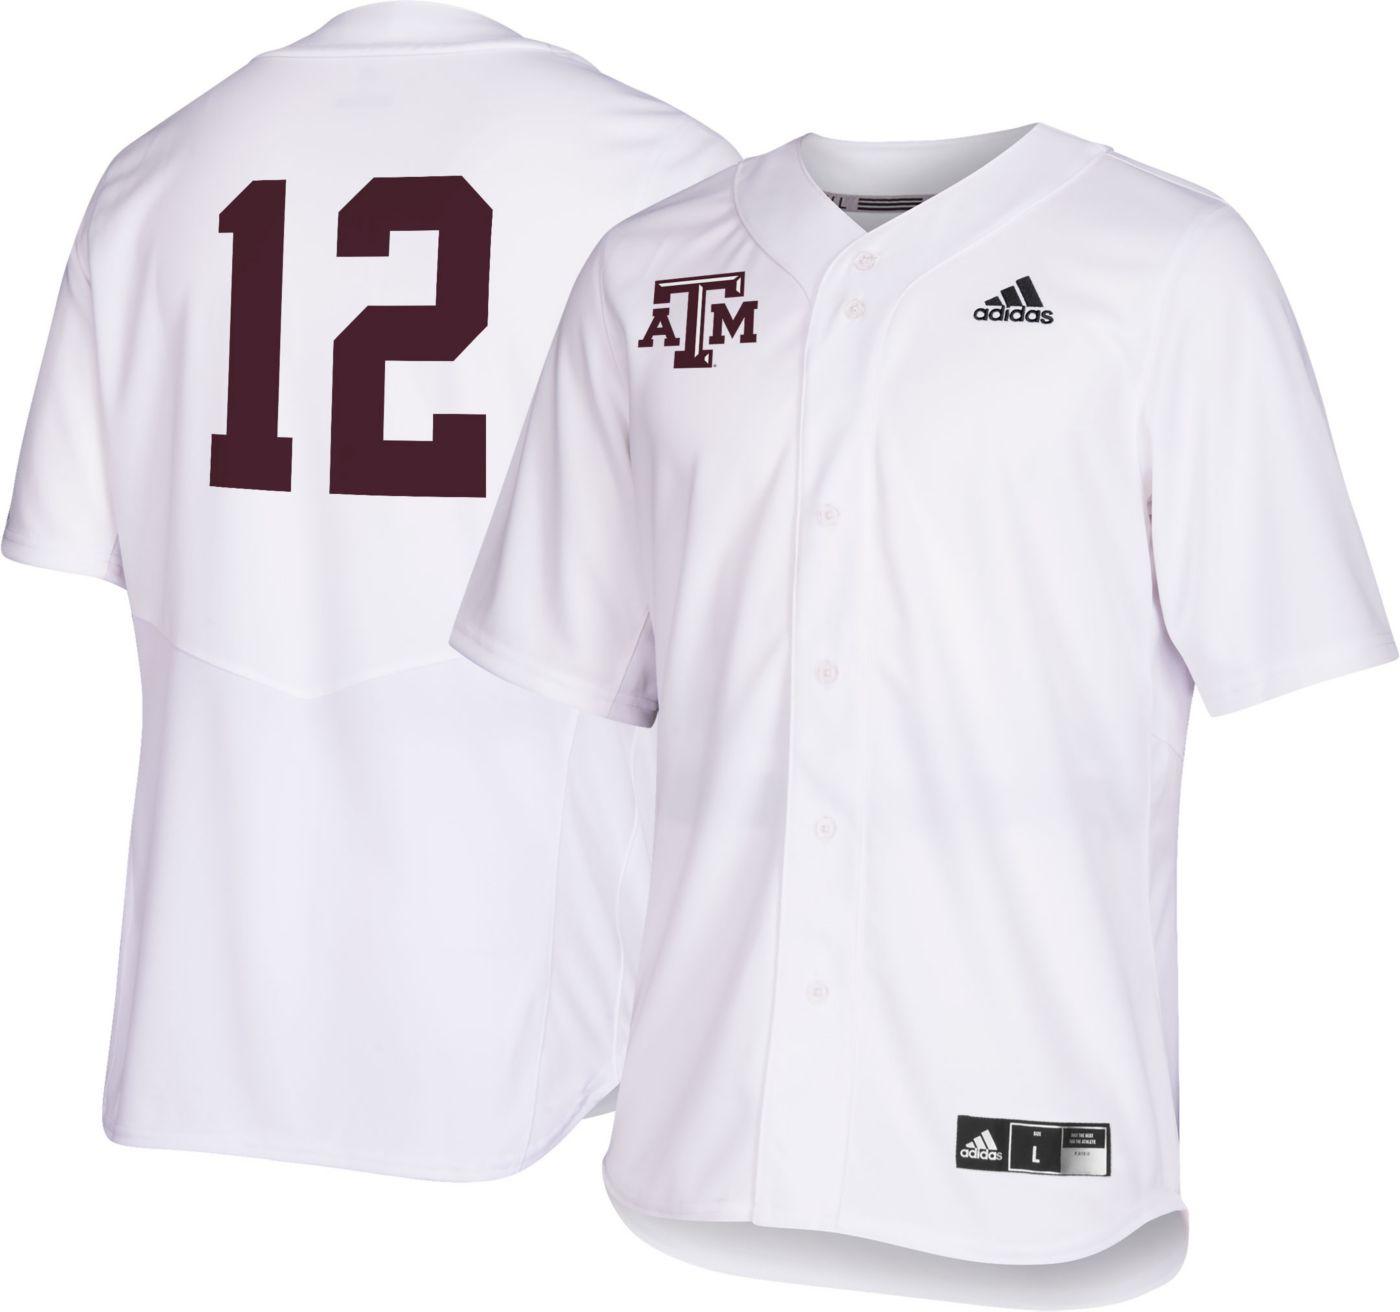 adidas Men's Texas A&M Aggies #12 Replica Baseball White Jersey